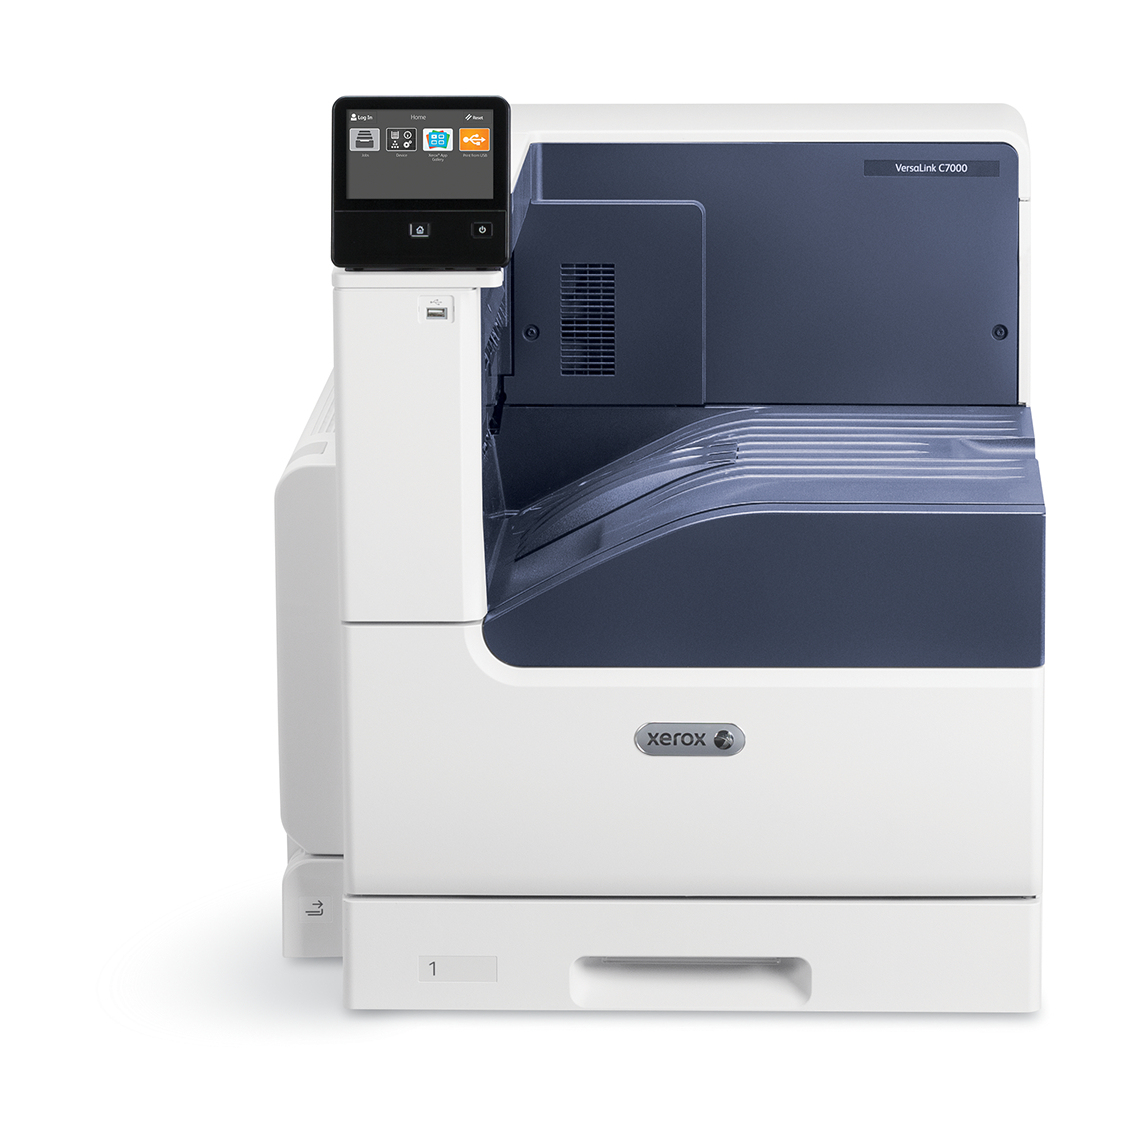 Xerox VersaLink C7000 A3 35/35 Ppm Printer Adobe Ps3 Pcl5E/6 2 Trays Total 620 Sheets